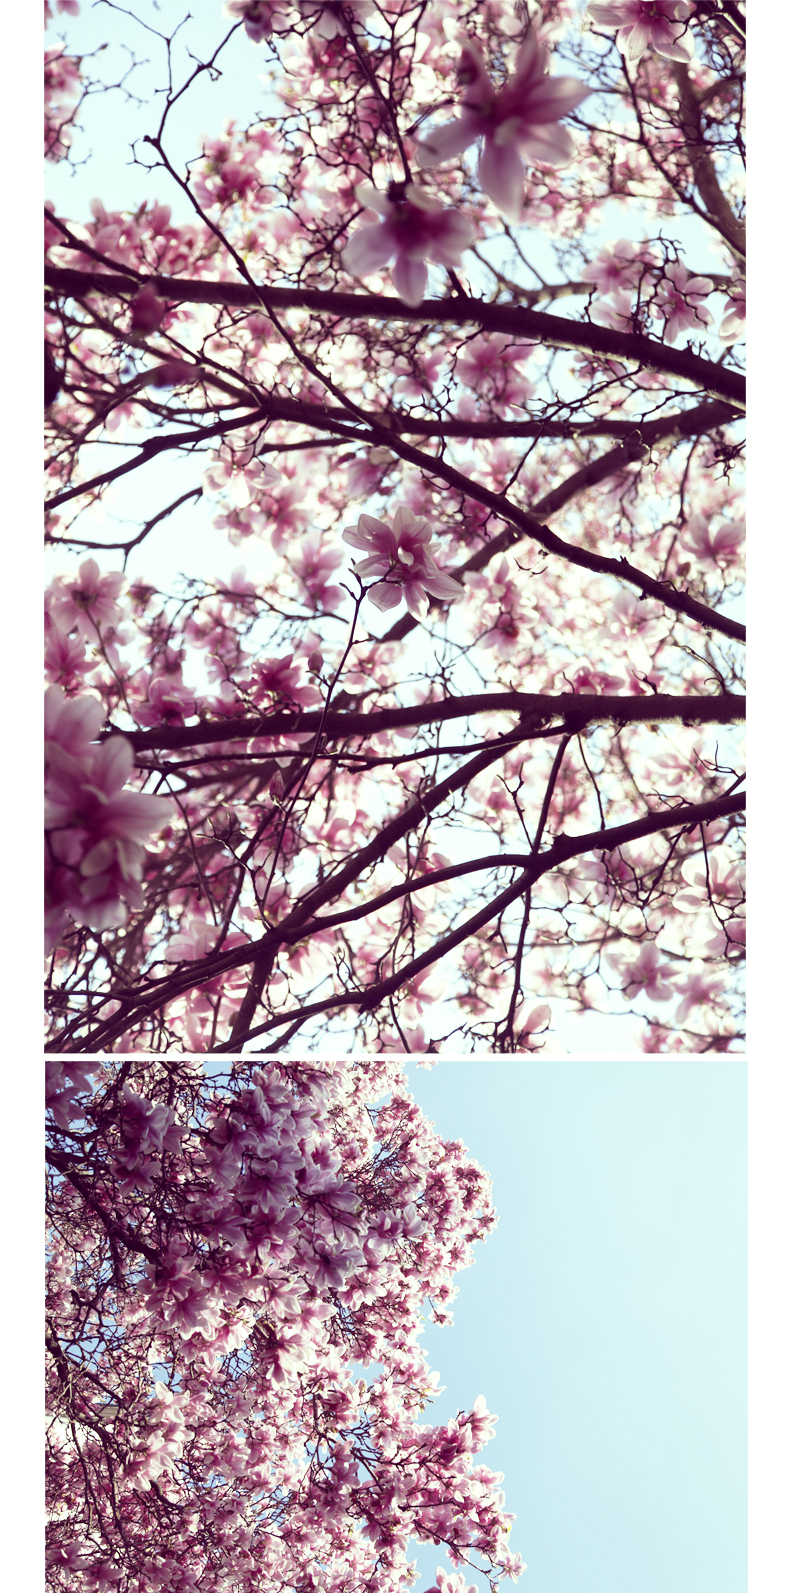 magnolia dans le ciel